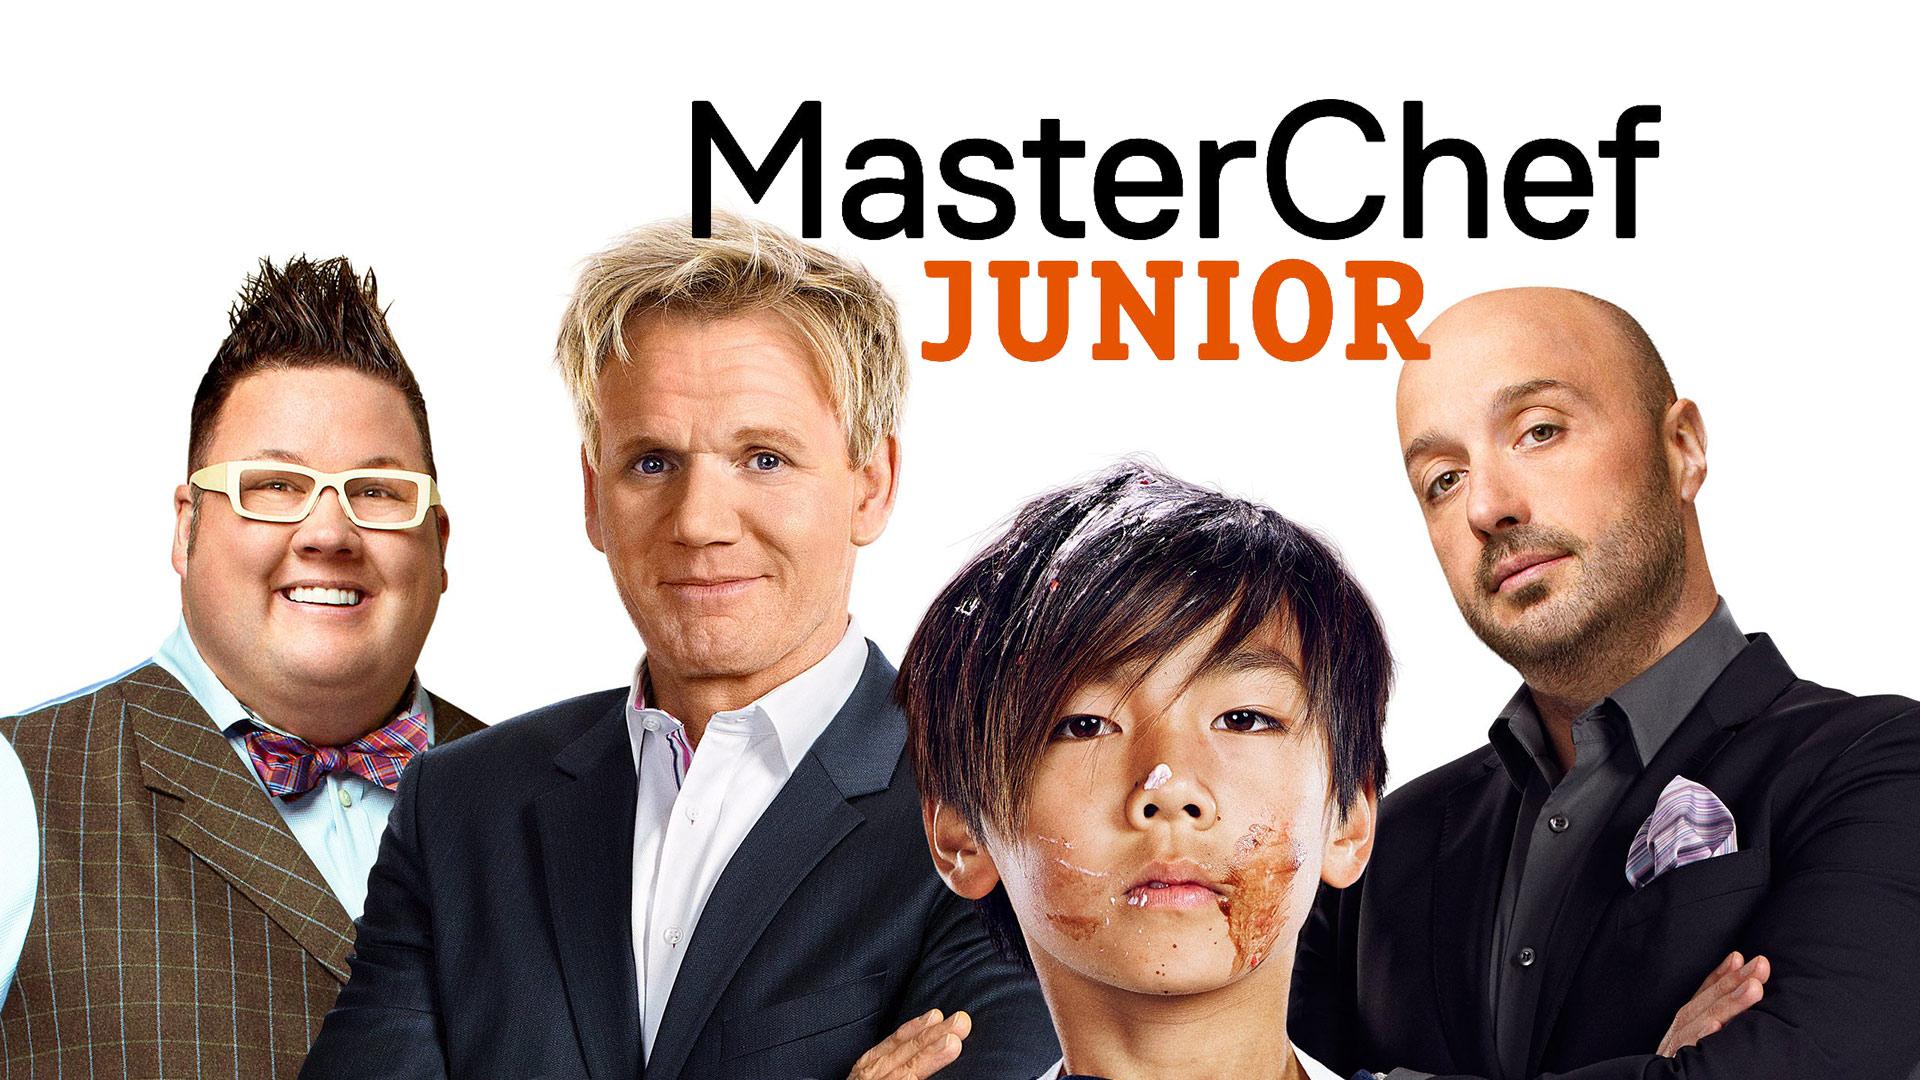 MasterChef Junior Season 1